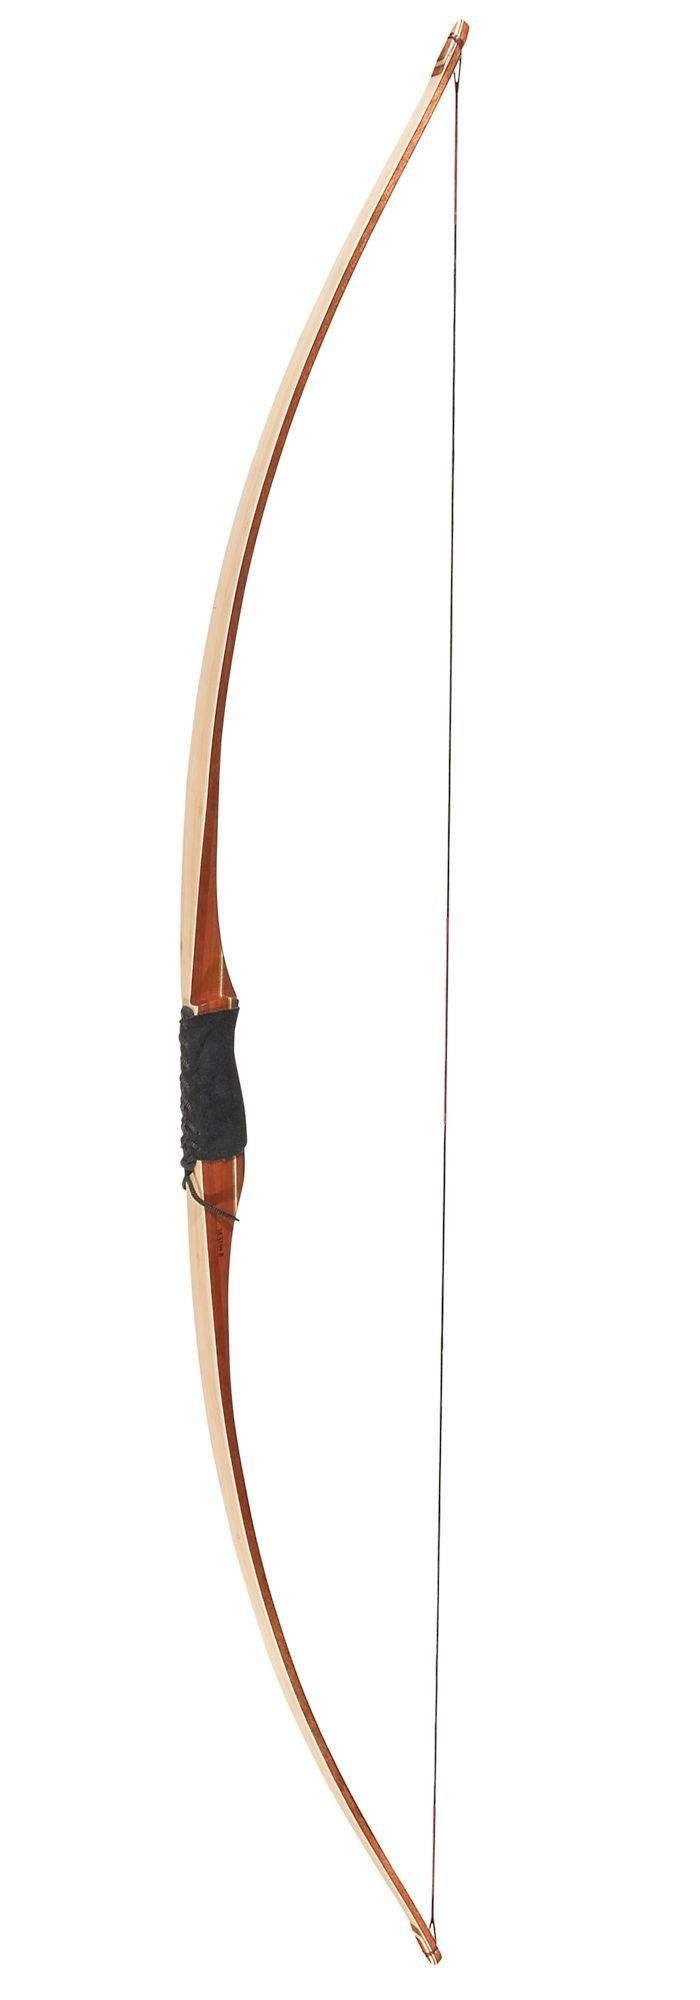 PSE Archery Sequoia Longbow |  Bass Pro Shops